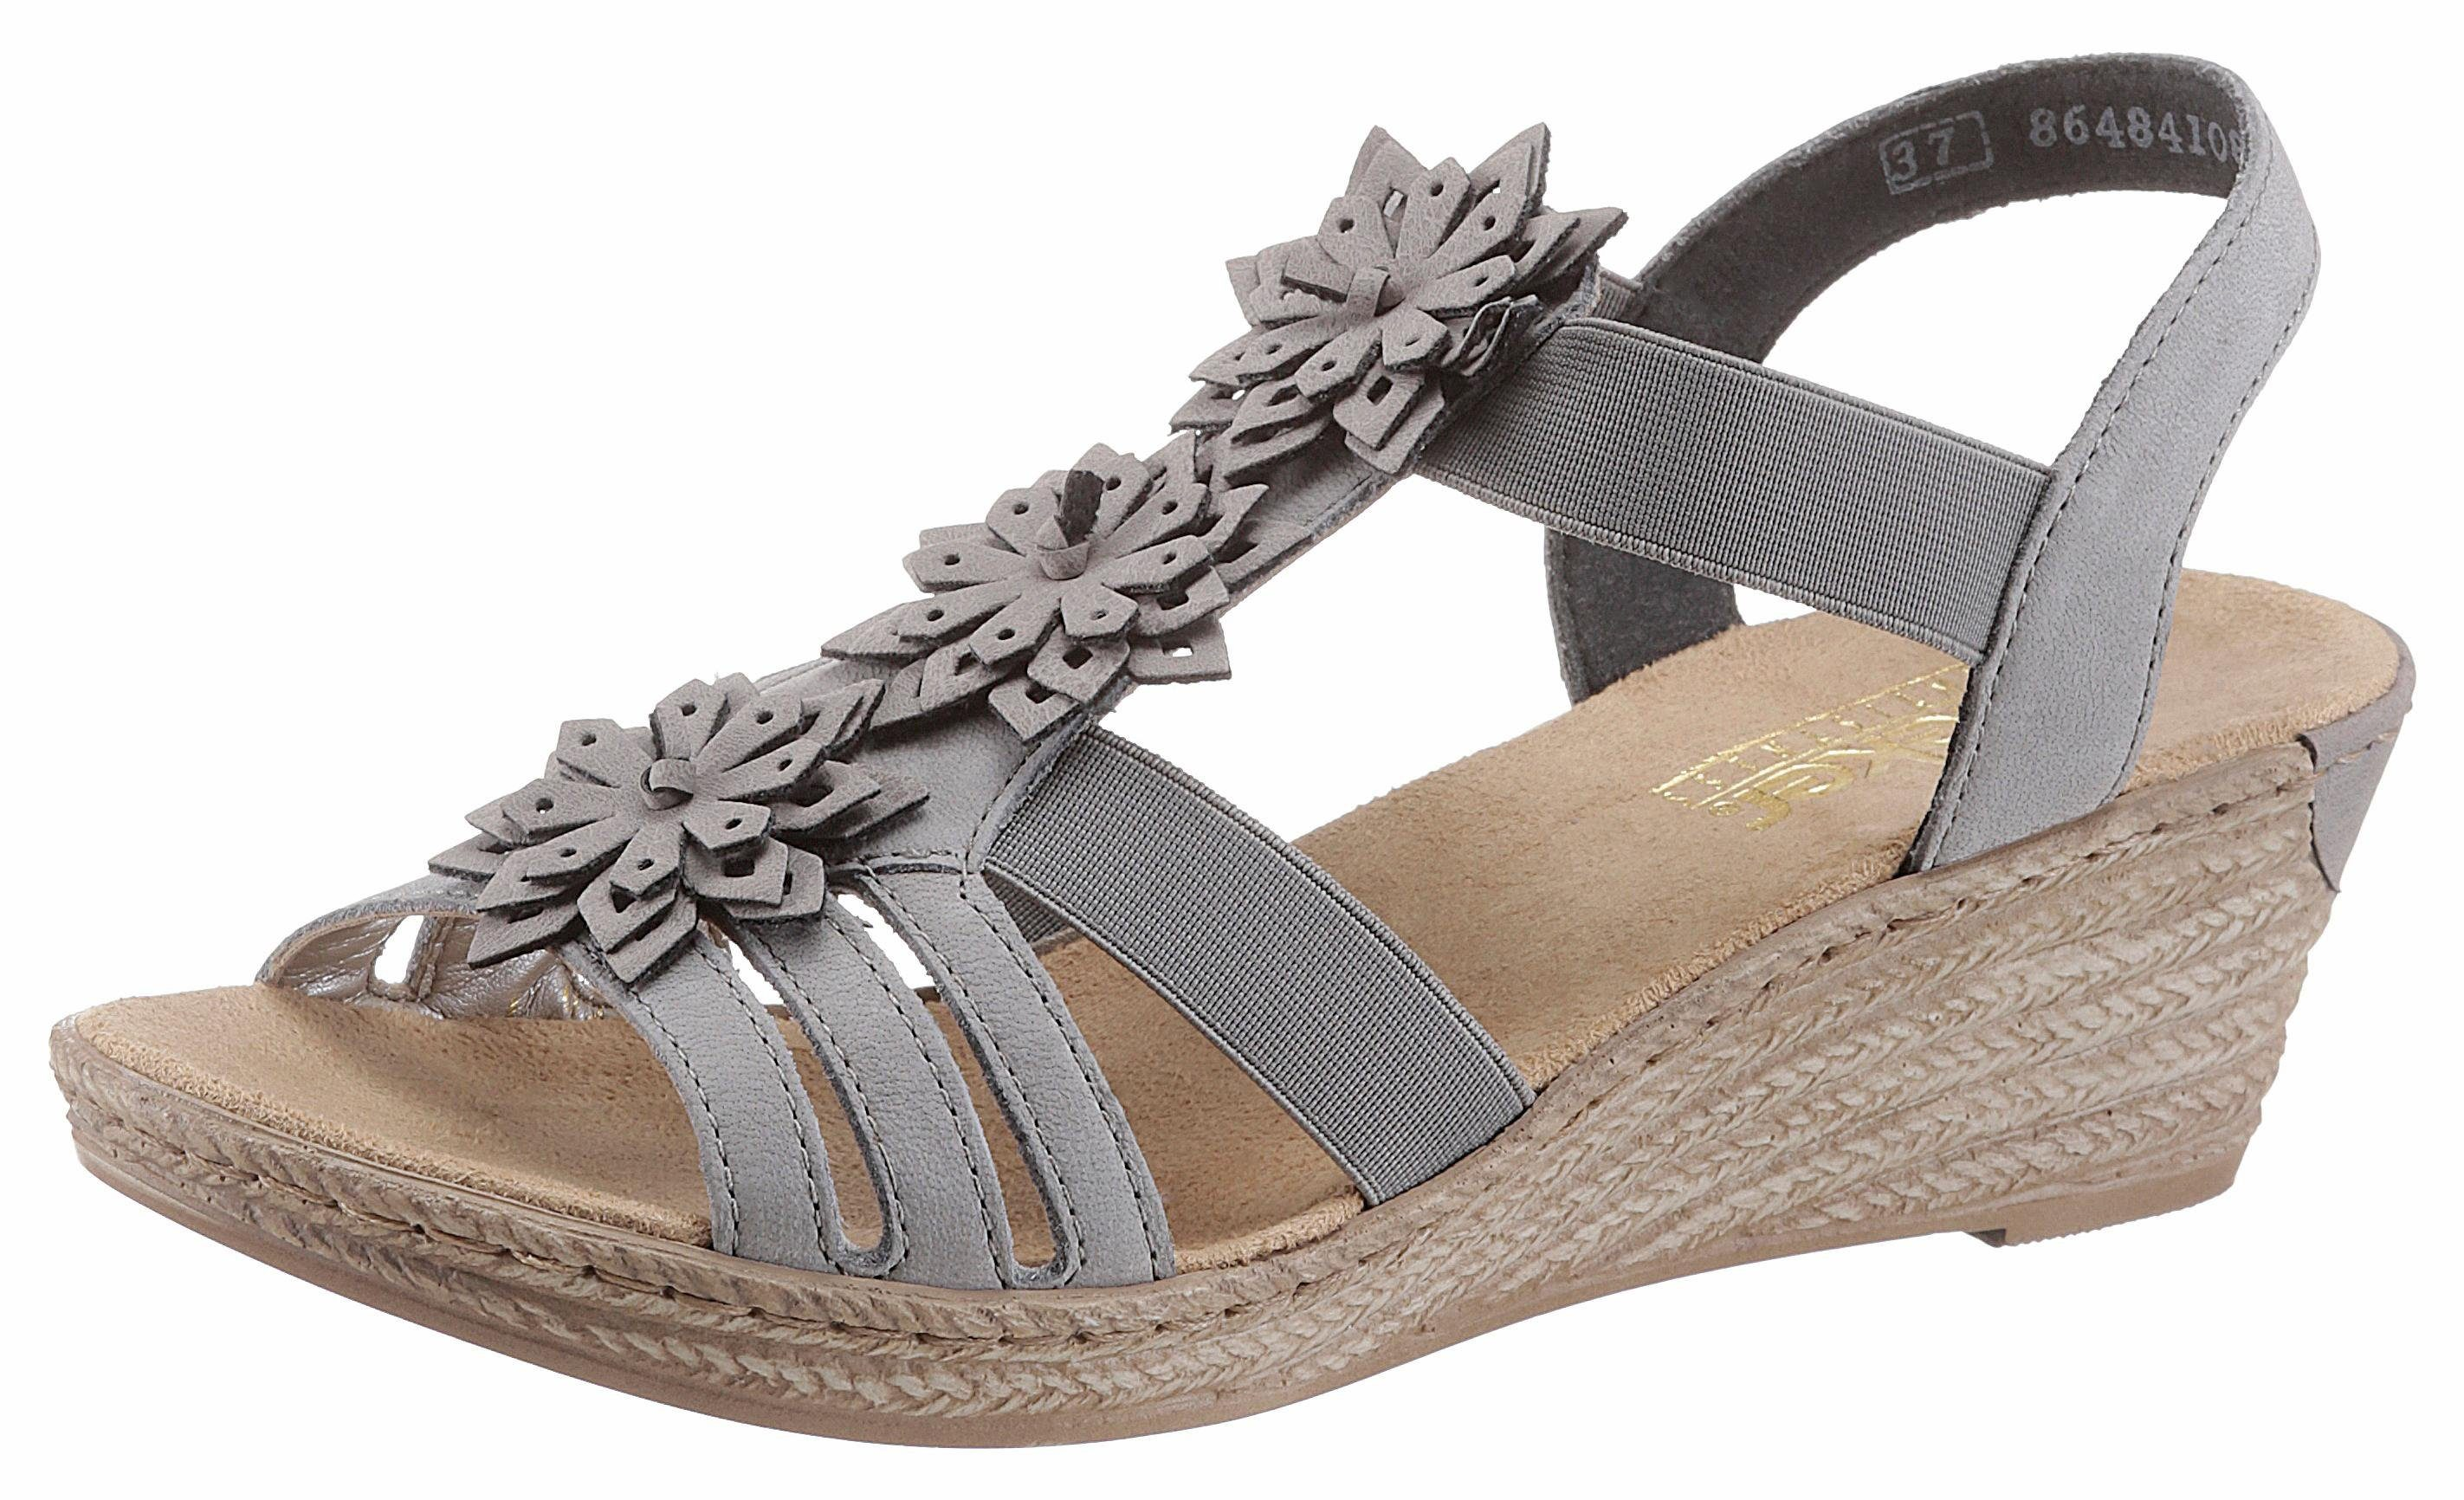 Rieker Sandalette, mit modischen Blüten verziert  grau